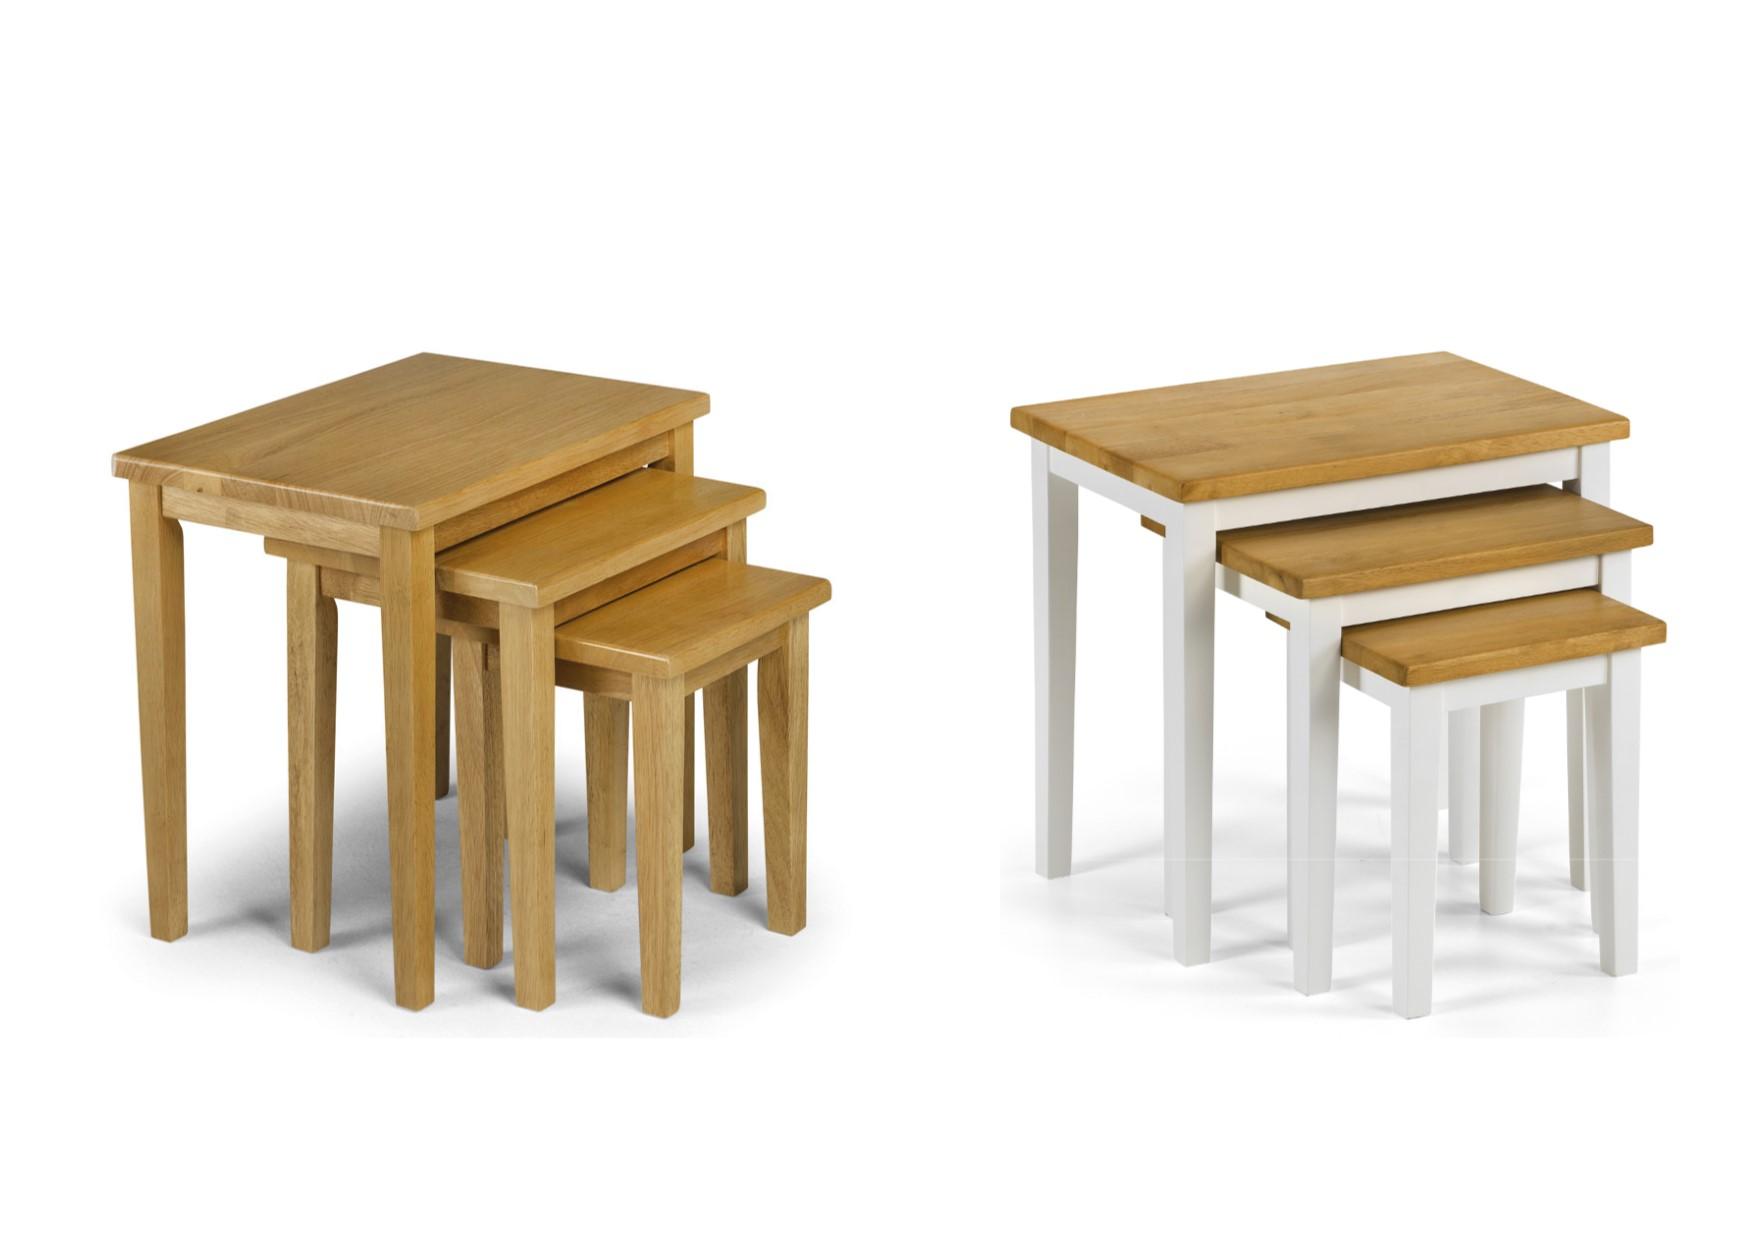 julian bowen cleo nest of tables light oak white oak. Black Bedroom Furniture Sets. Home Design Ideas